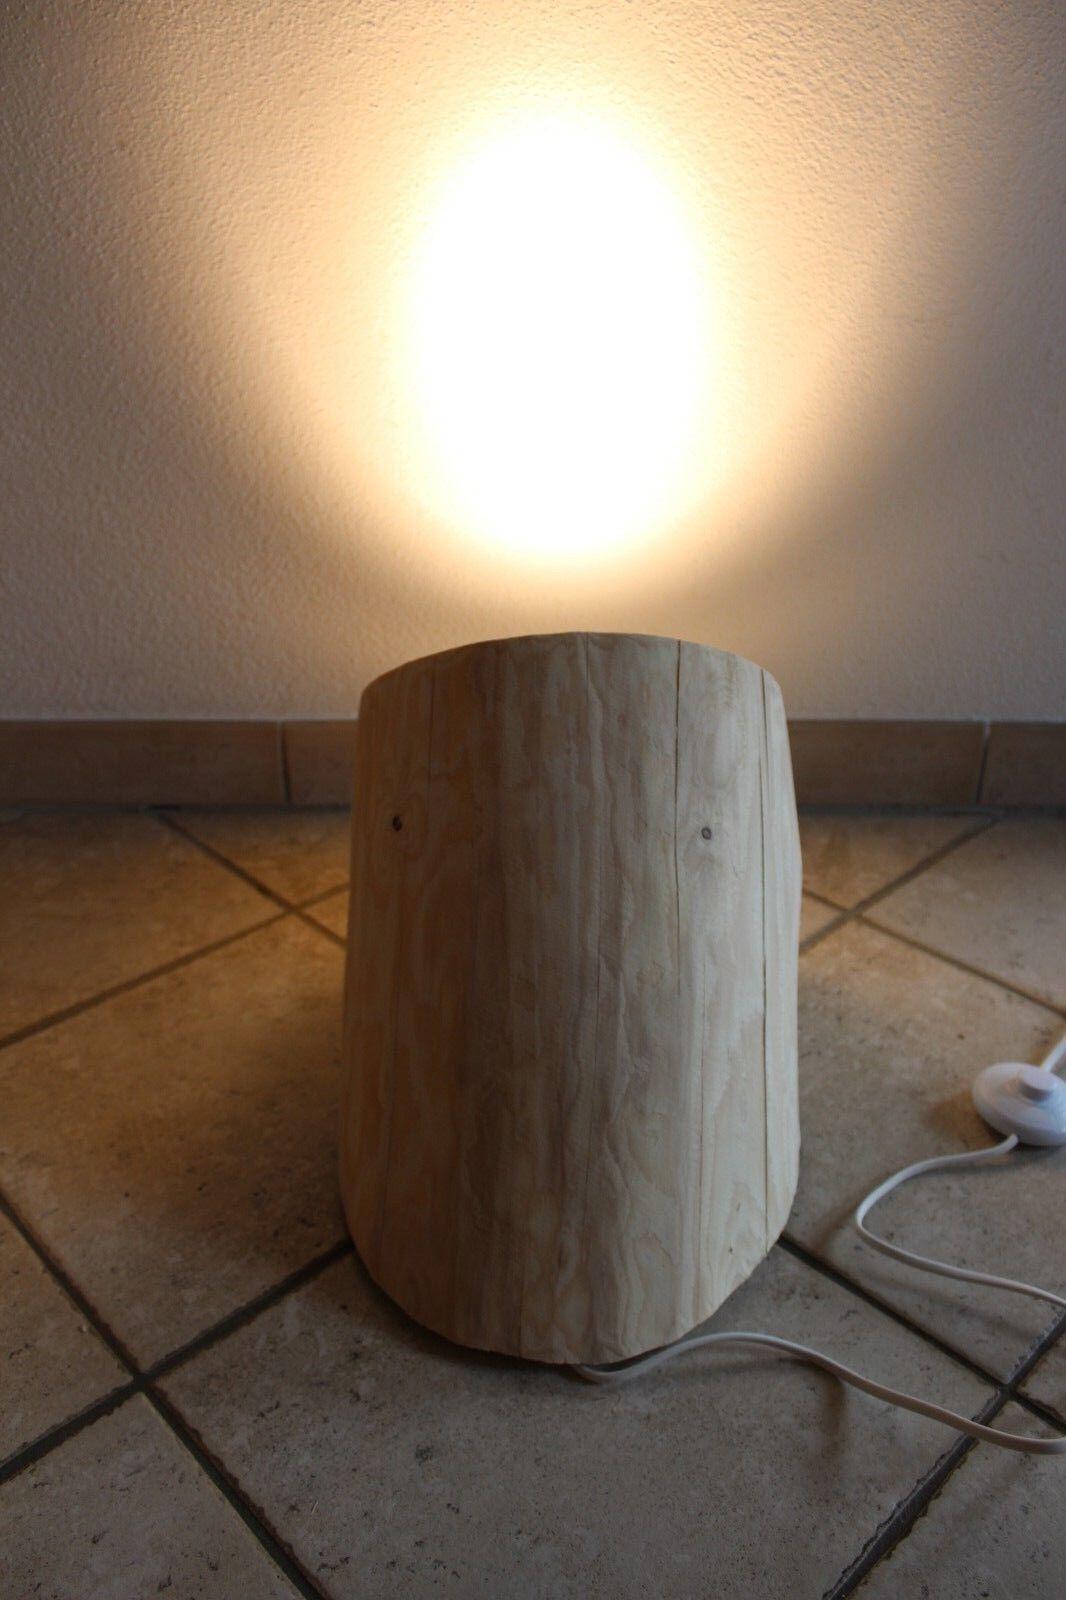 Nr.214, Bodenfluter, 46cm x 27cm x 28cm, Stehlampe, Holz lampe, Deckenfluter